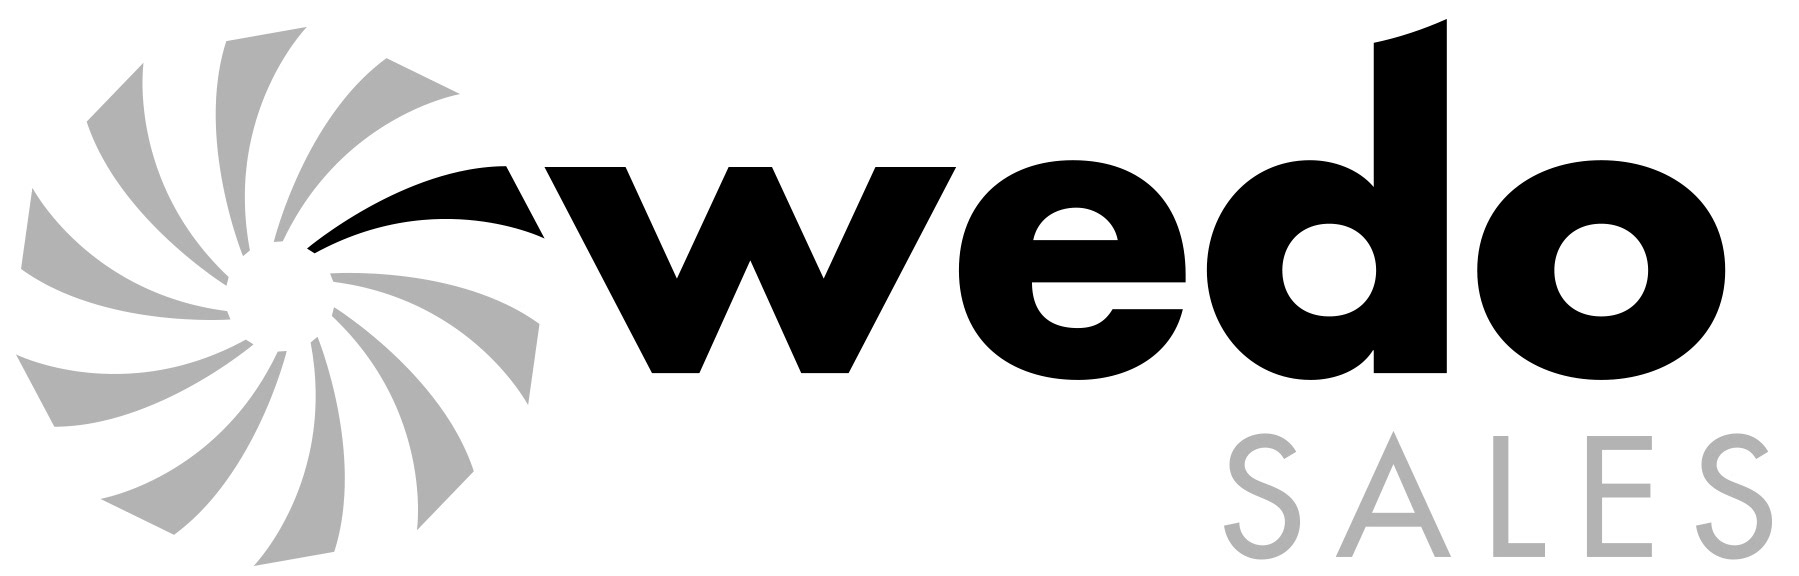 wedo sales